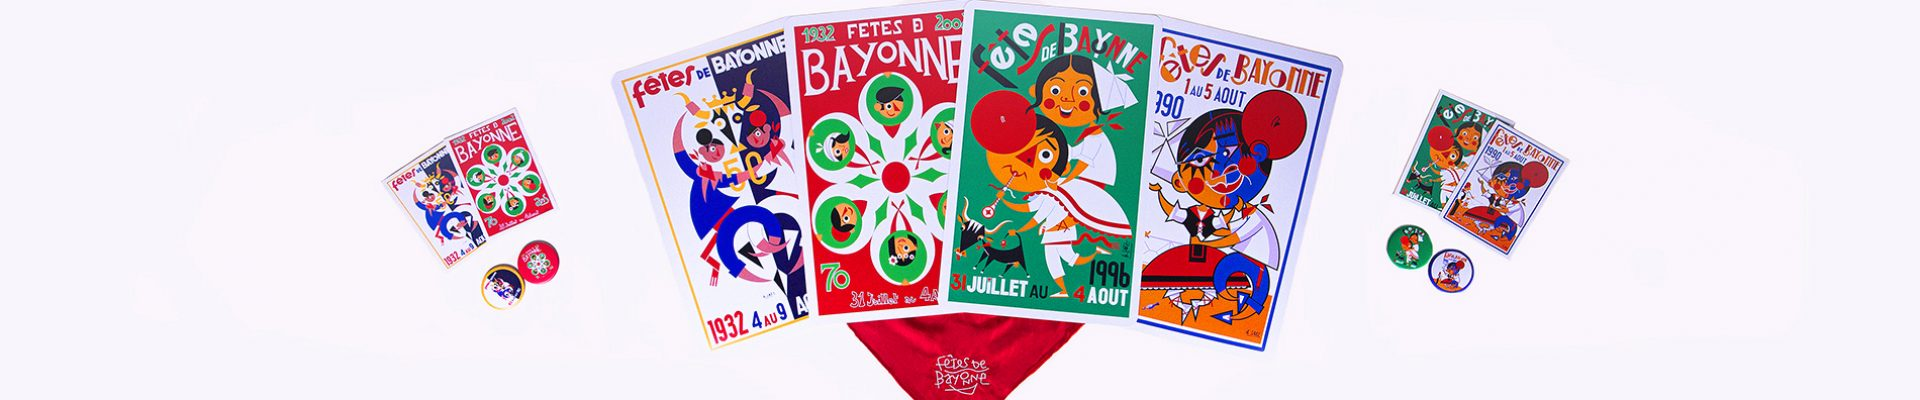 header Collection fêtes de Bayonne